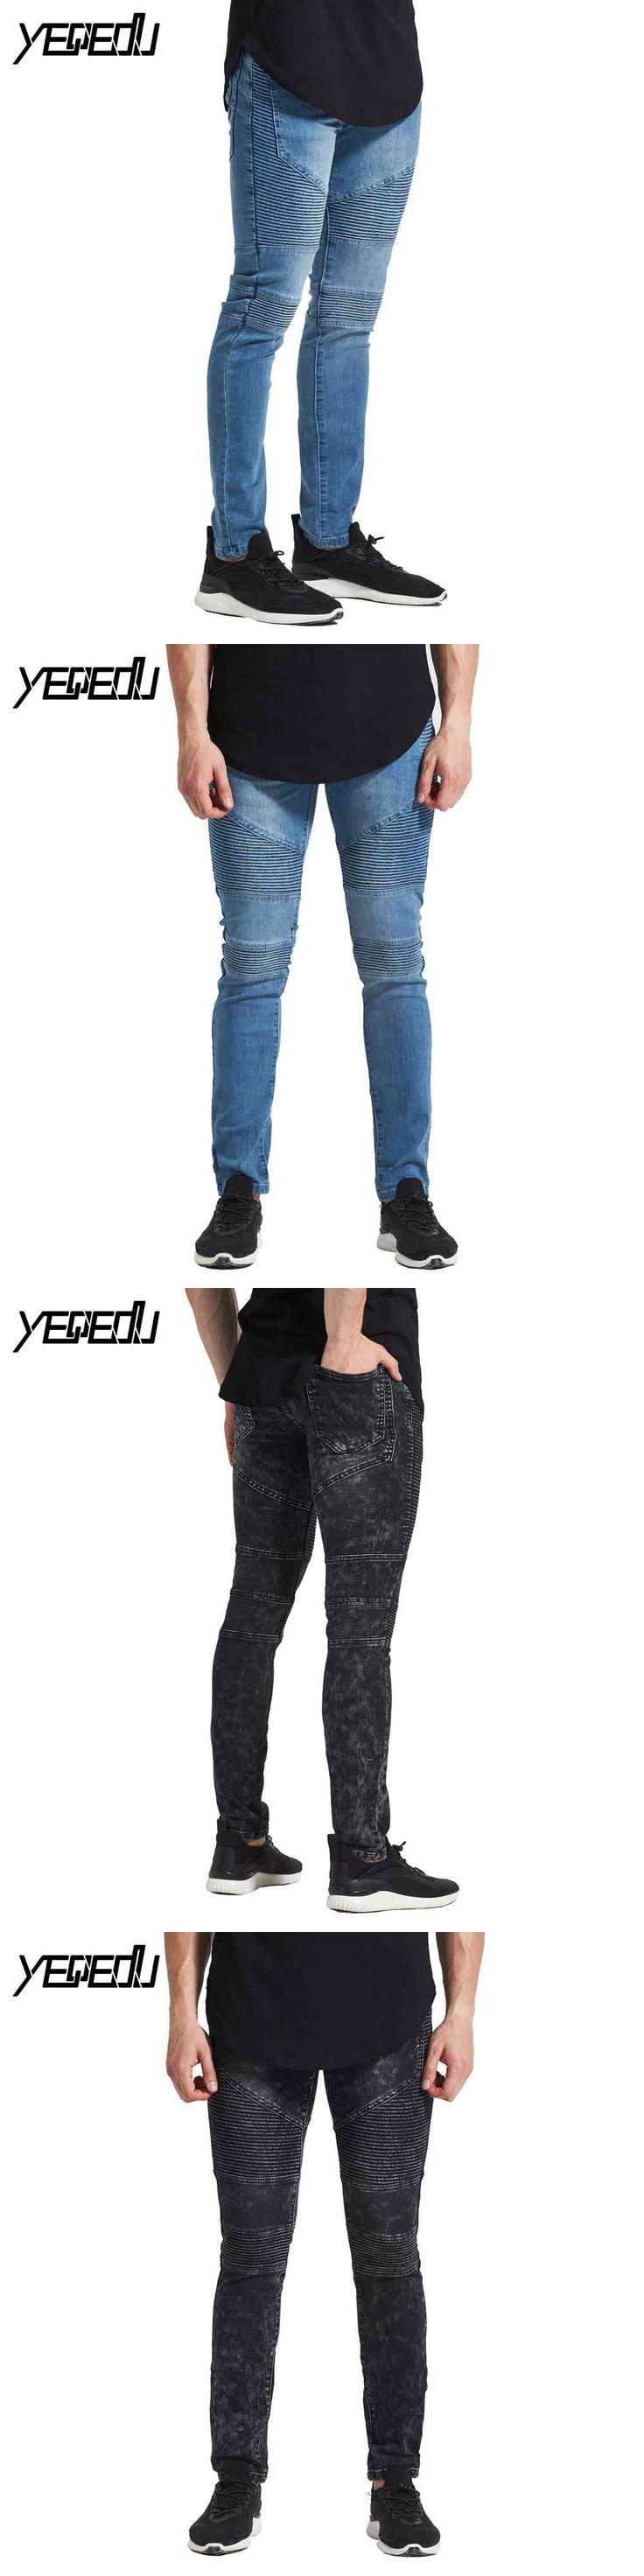 #2107 Moto biker jeans men Skinny Punk Hip hop jeans Stretch jean homme Black/blue Jogger jeans for men Punk Distressed Bikers